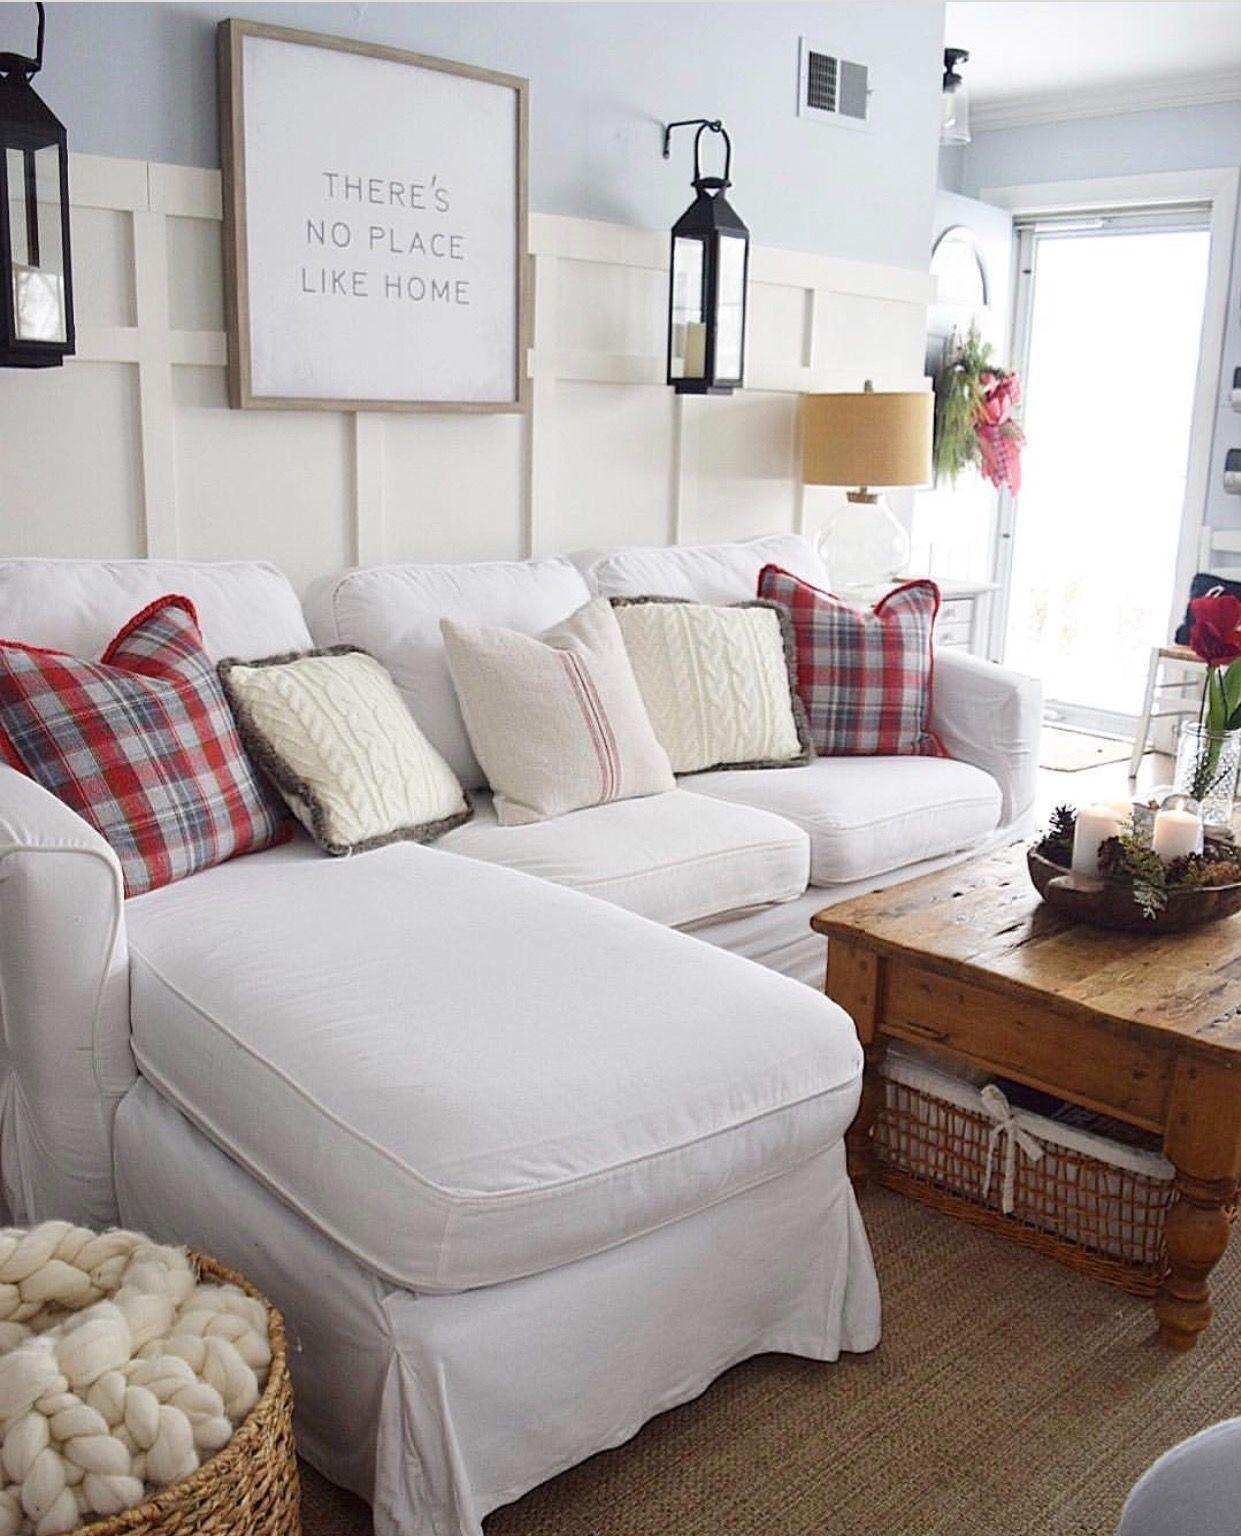 Winter Living Room Decorating: 49 Cozy Winter Living Room Decorating Ideas